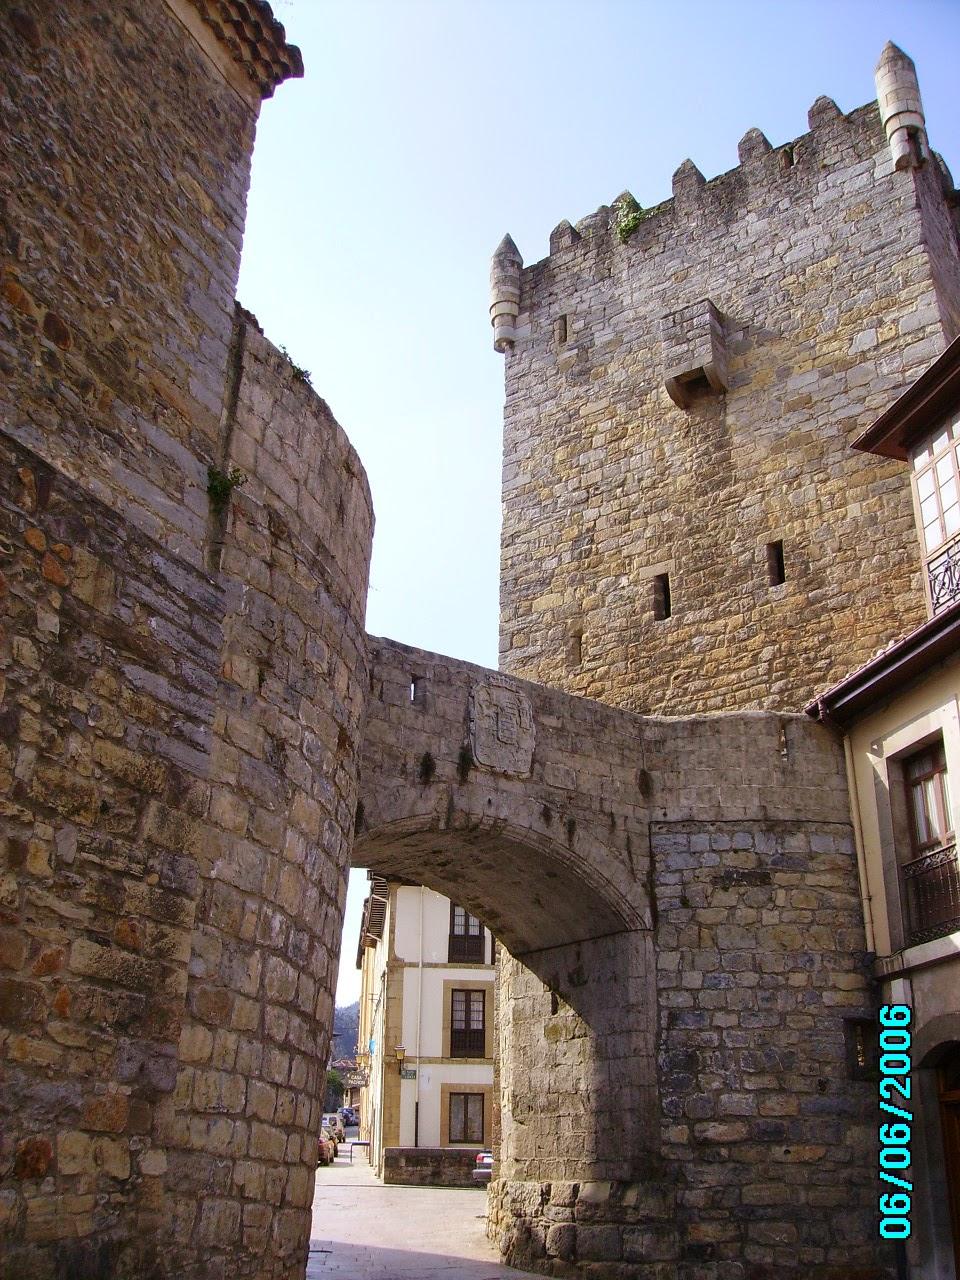 otrre de salas ideas de Asturias en familia